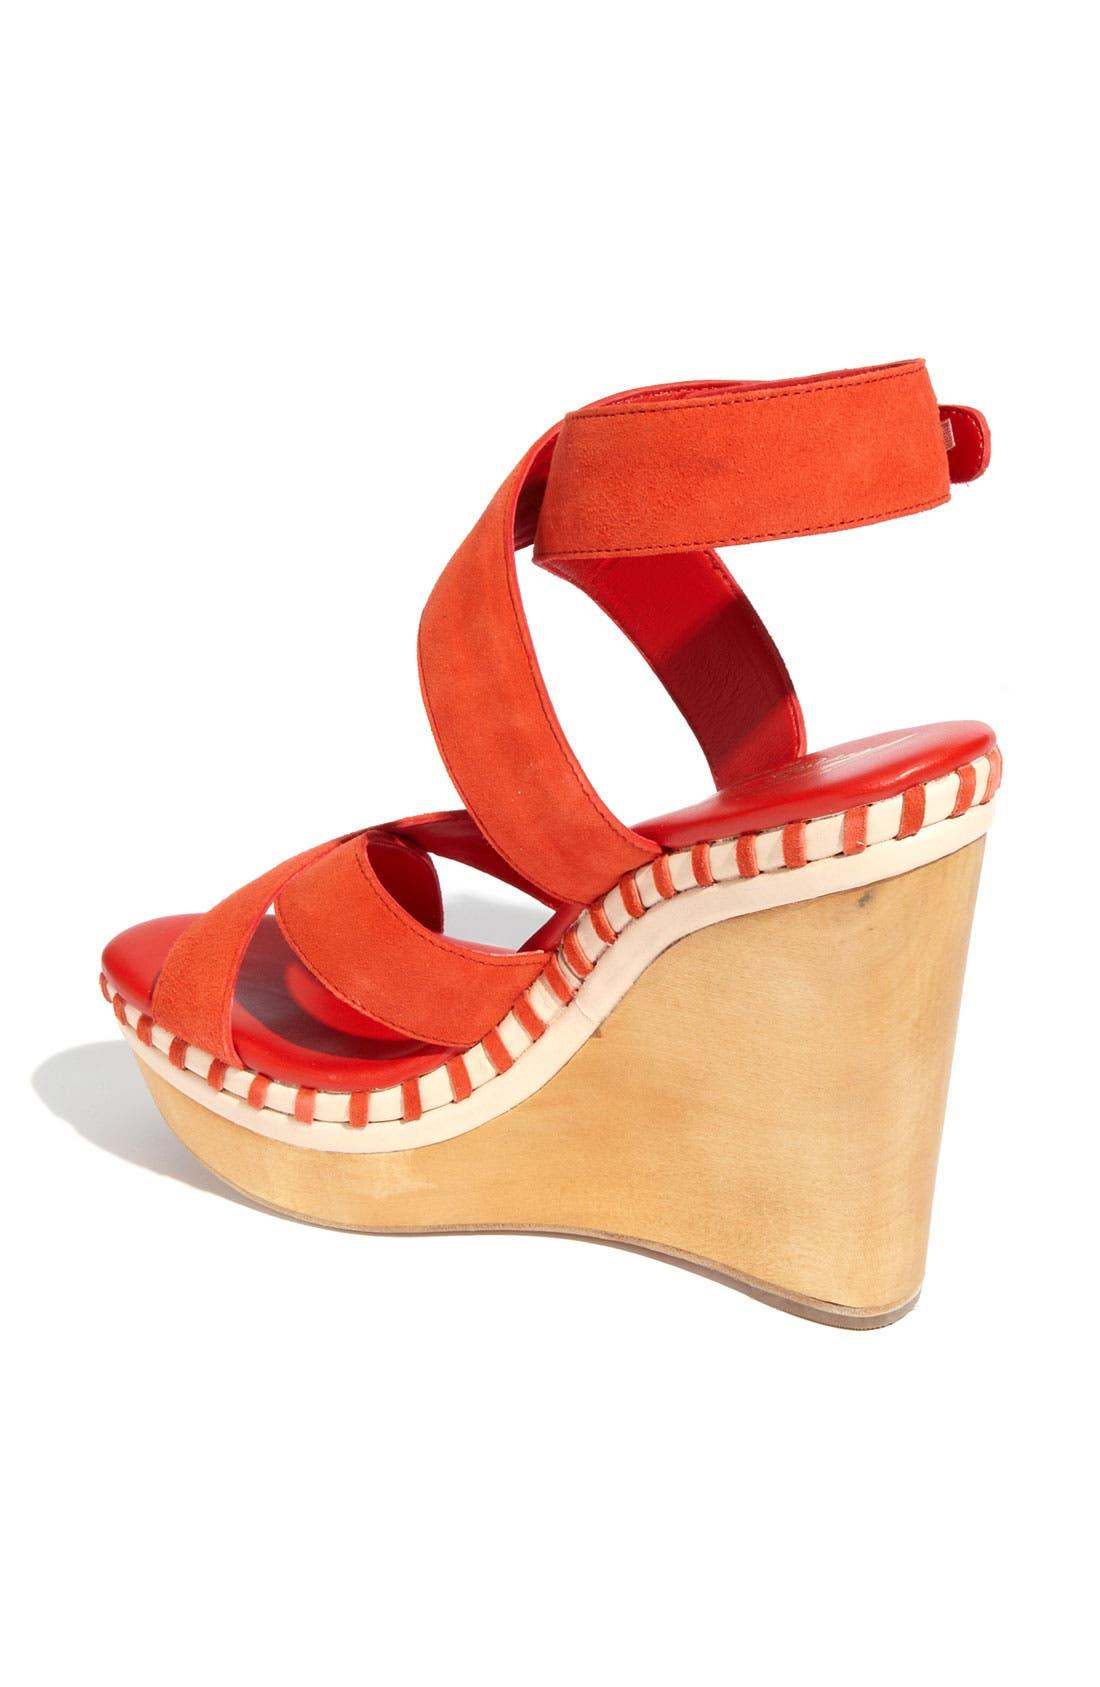 Alternate Image 2  - VC Signature 'Lene' Sandal (Exclusive)